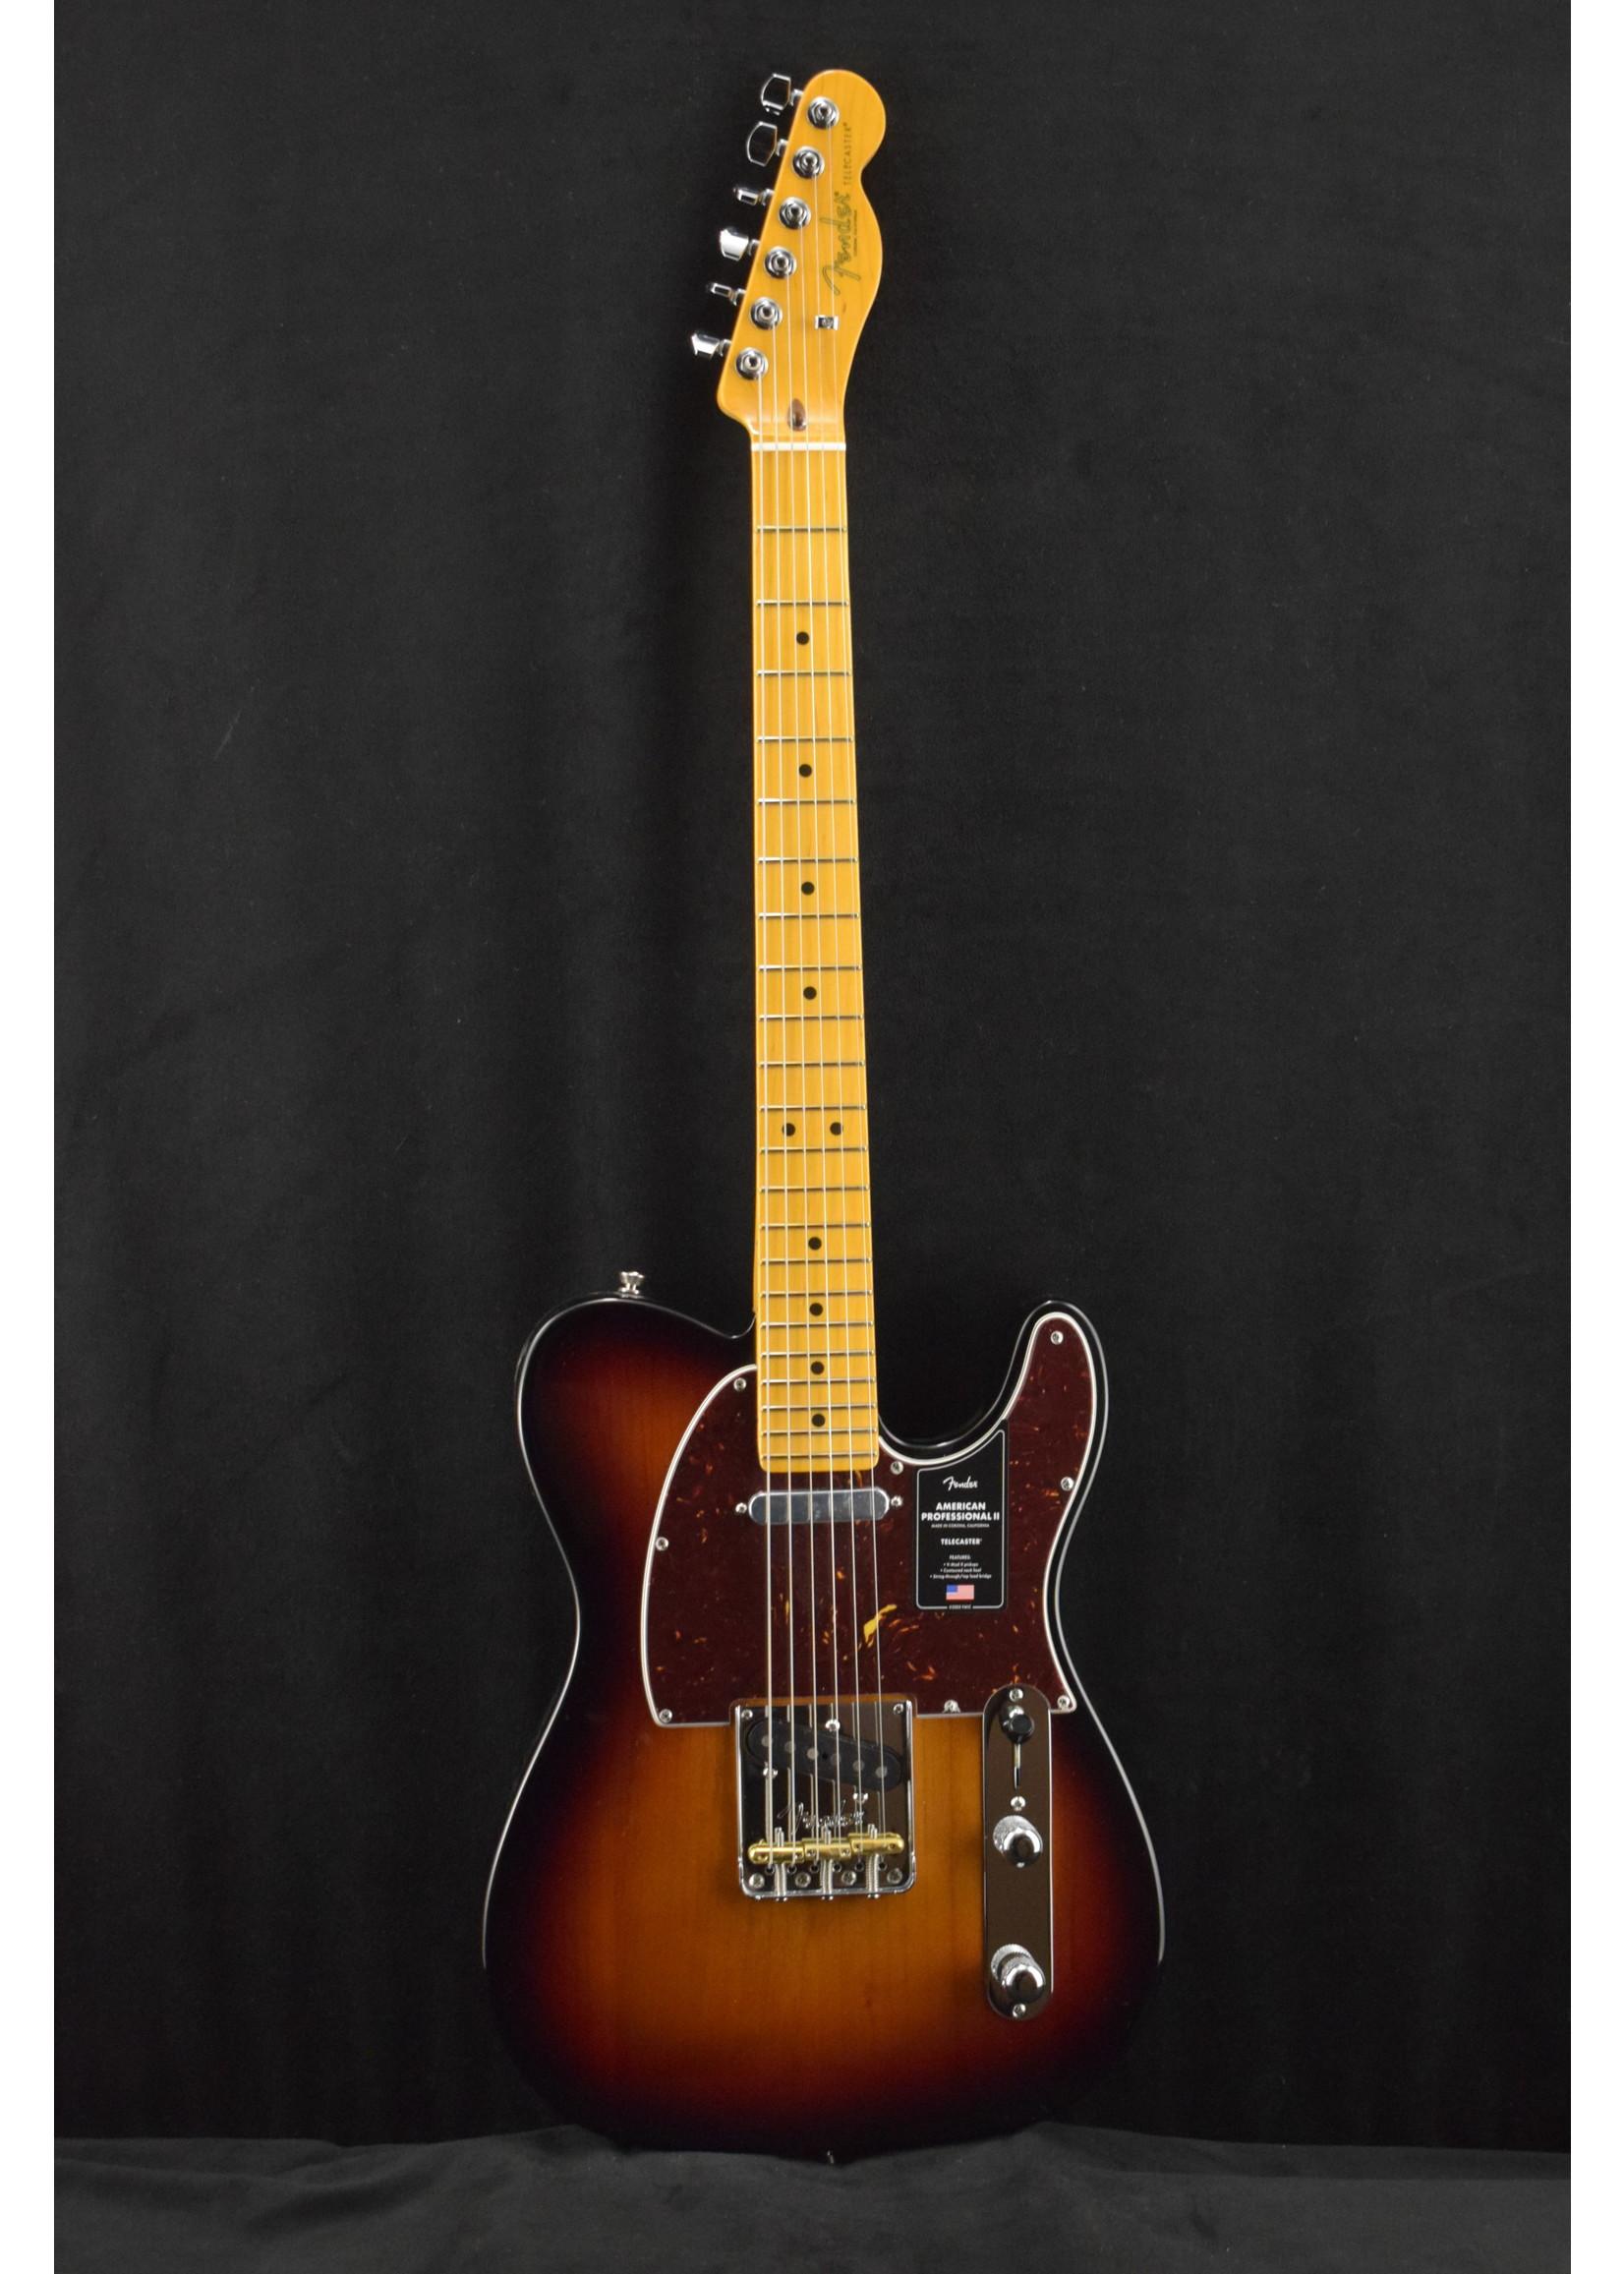 Fender Fender American Professional II Telecaster with Maple Fretboard 3-Color Sunburst